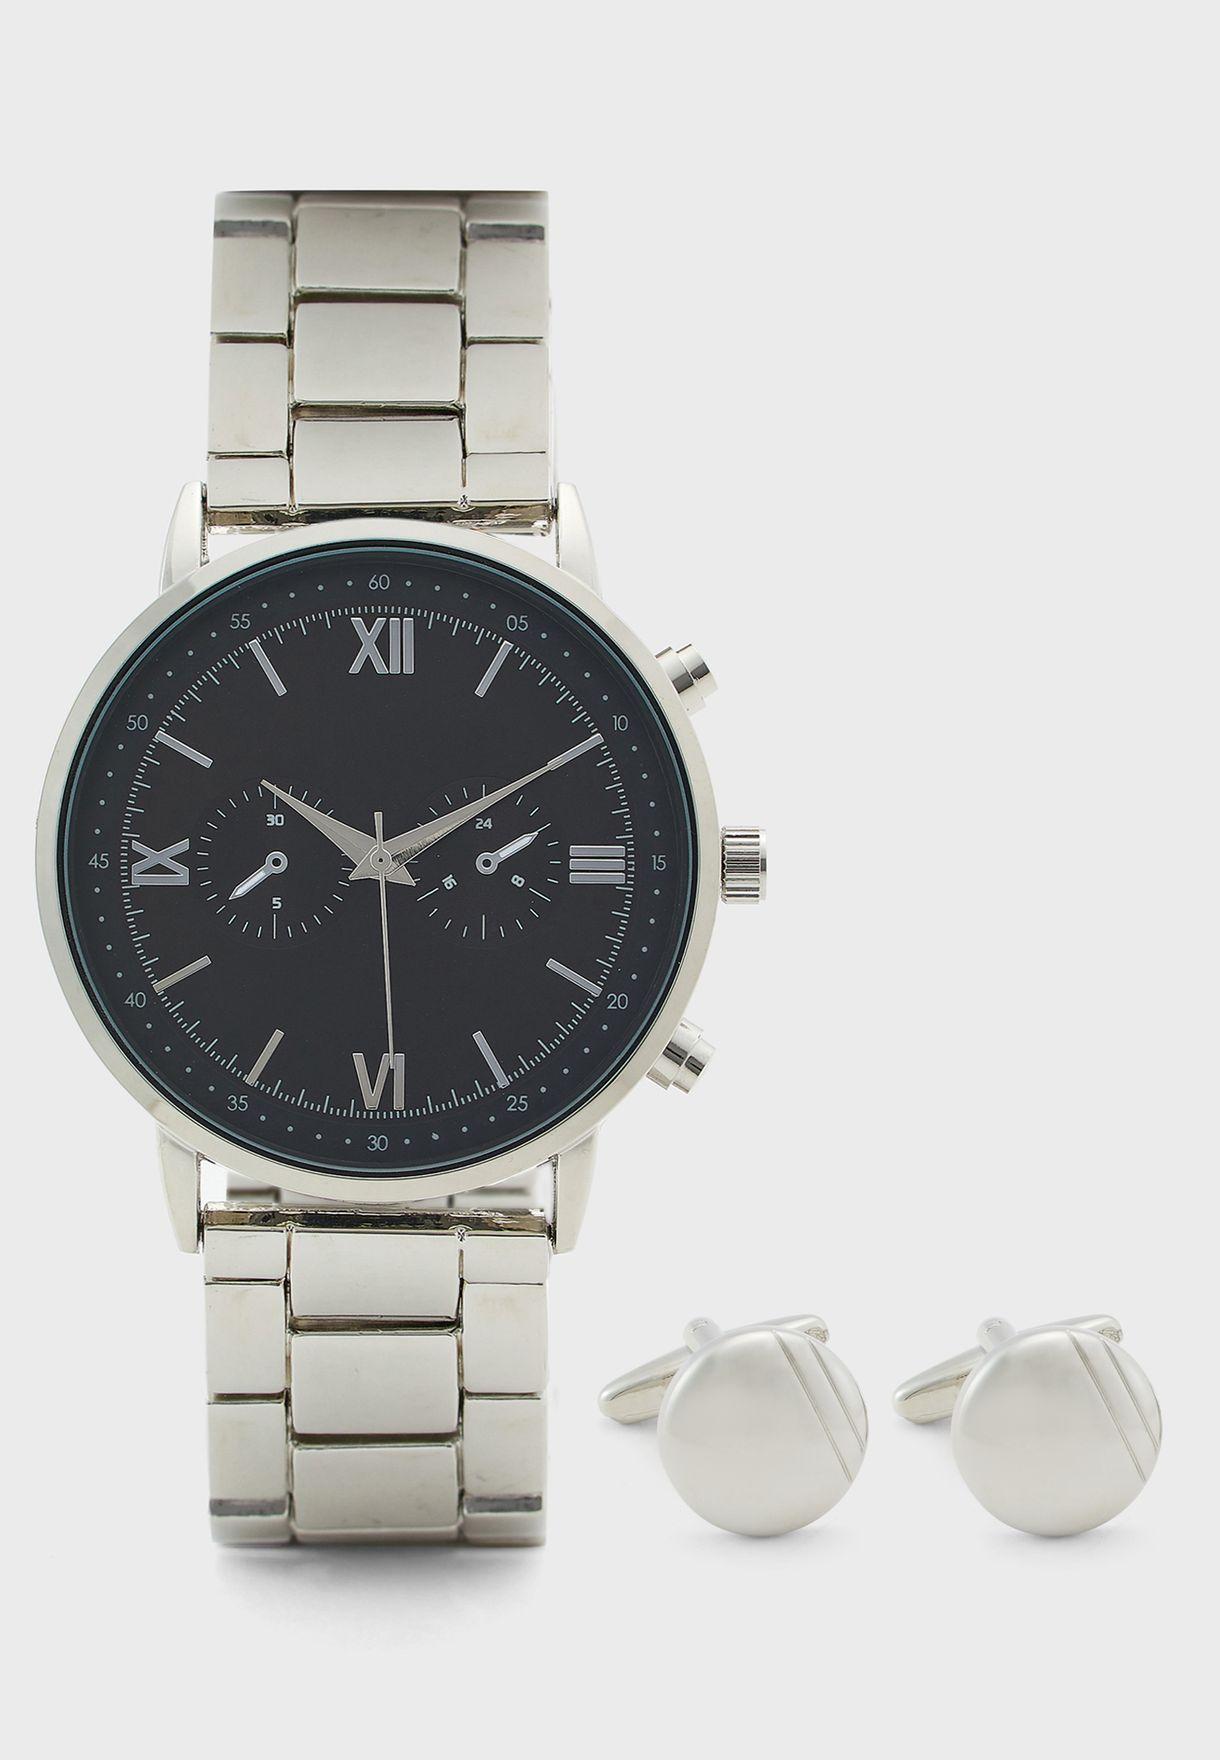 Watch And Cufflinks Gift Set